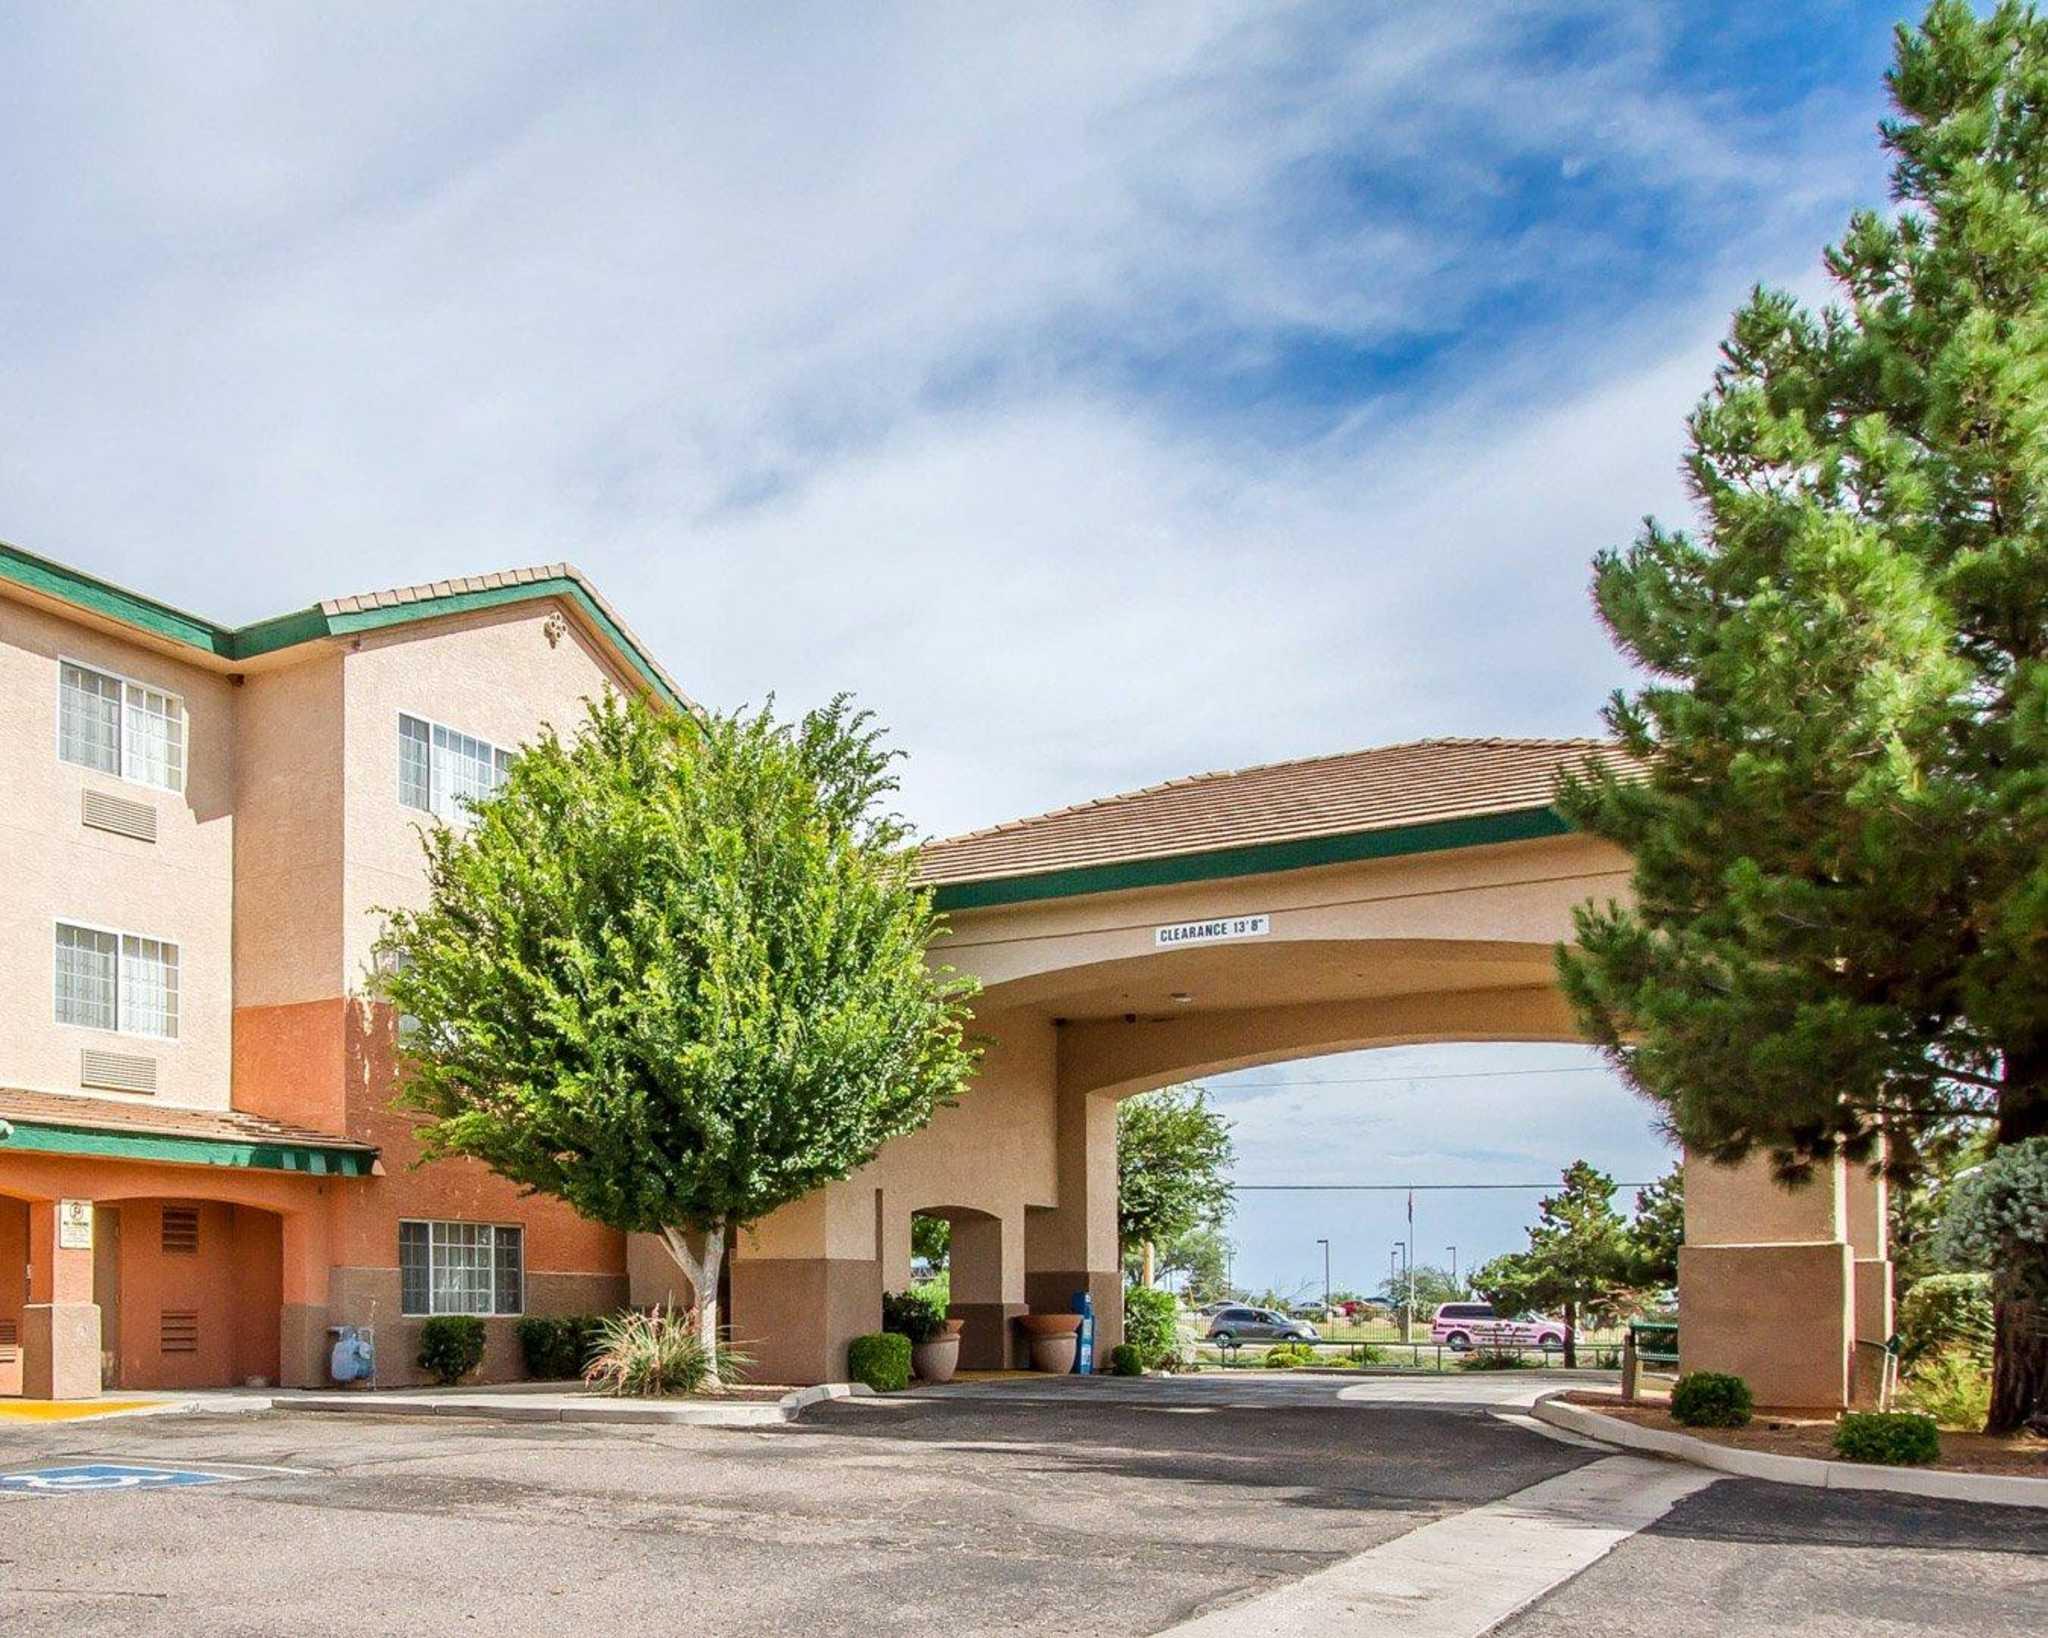 Comfort Inn Suites In Sierra Vista Az 85635